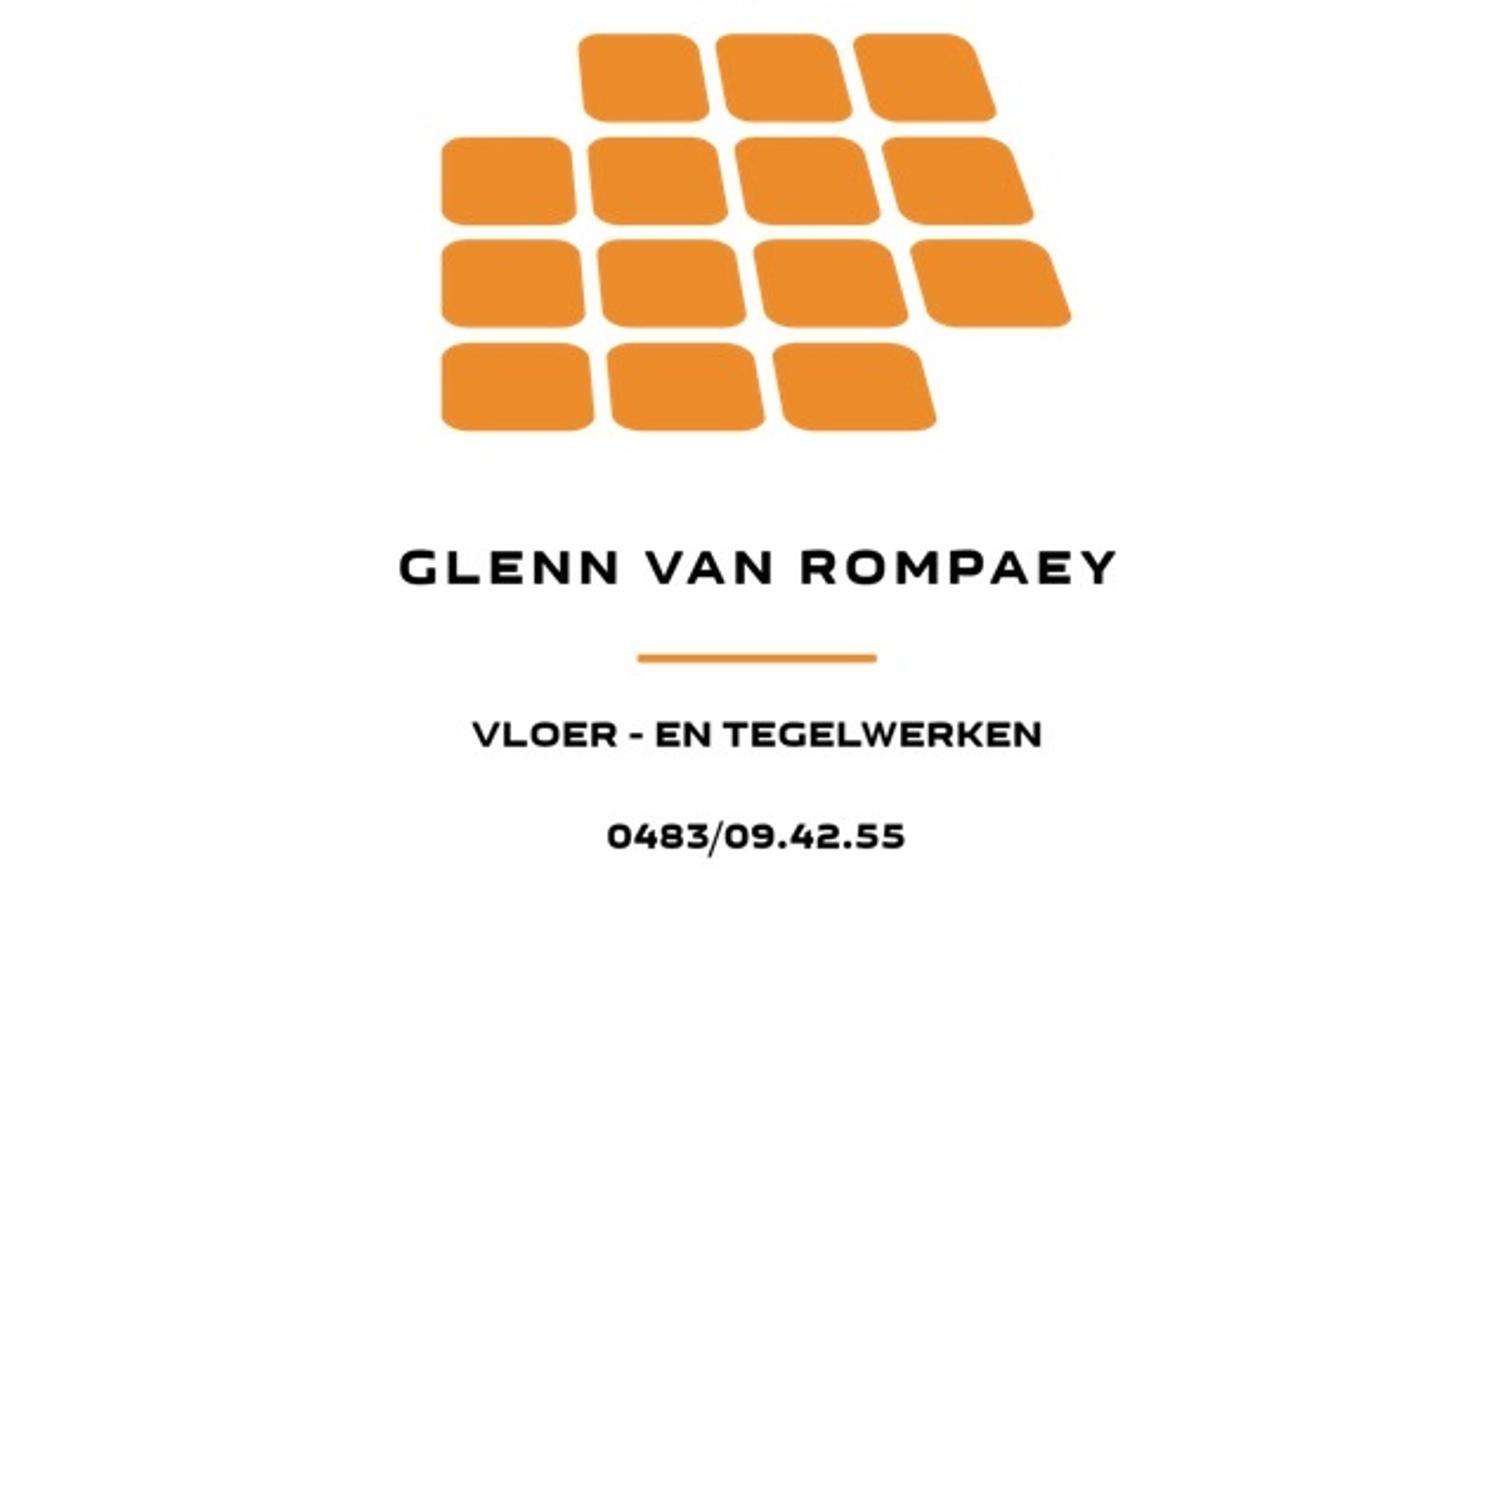 Glenn Van Rompaey logo